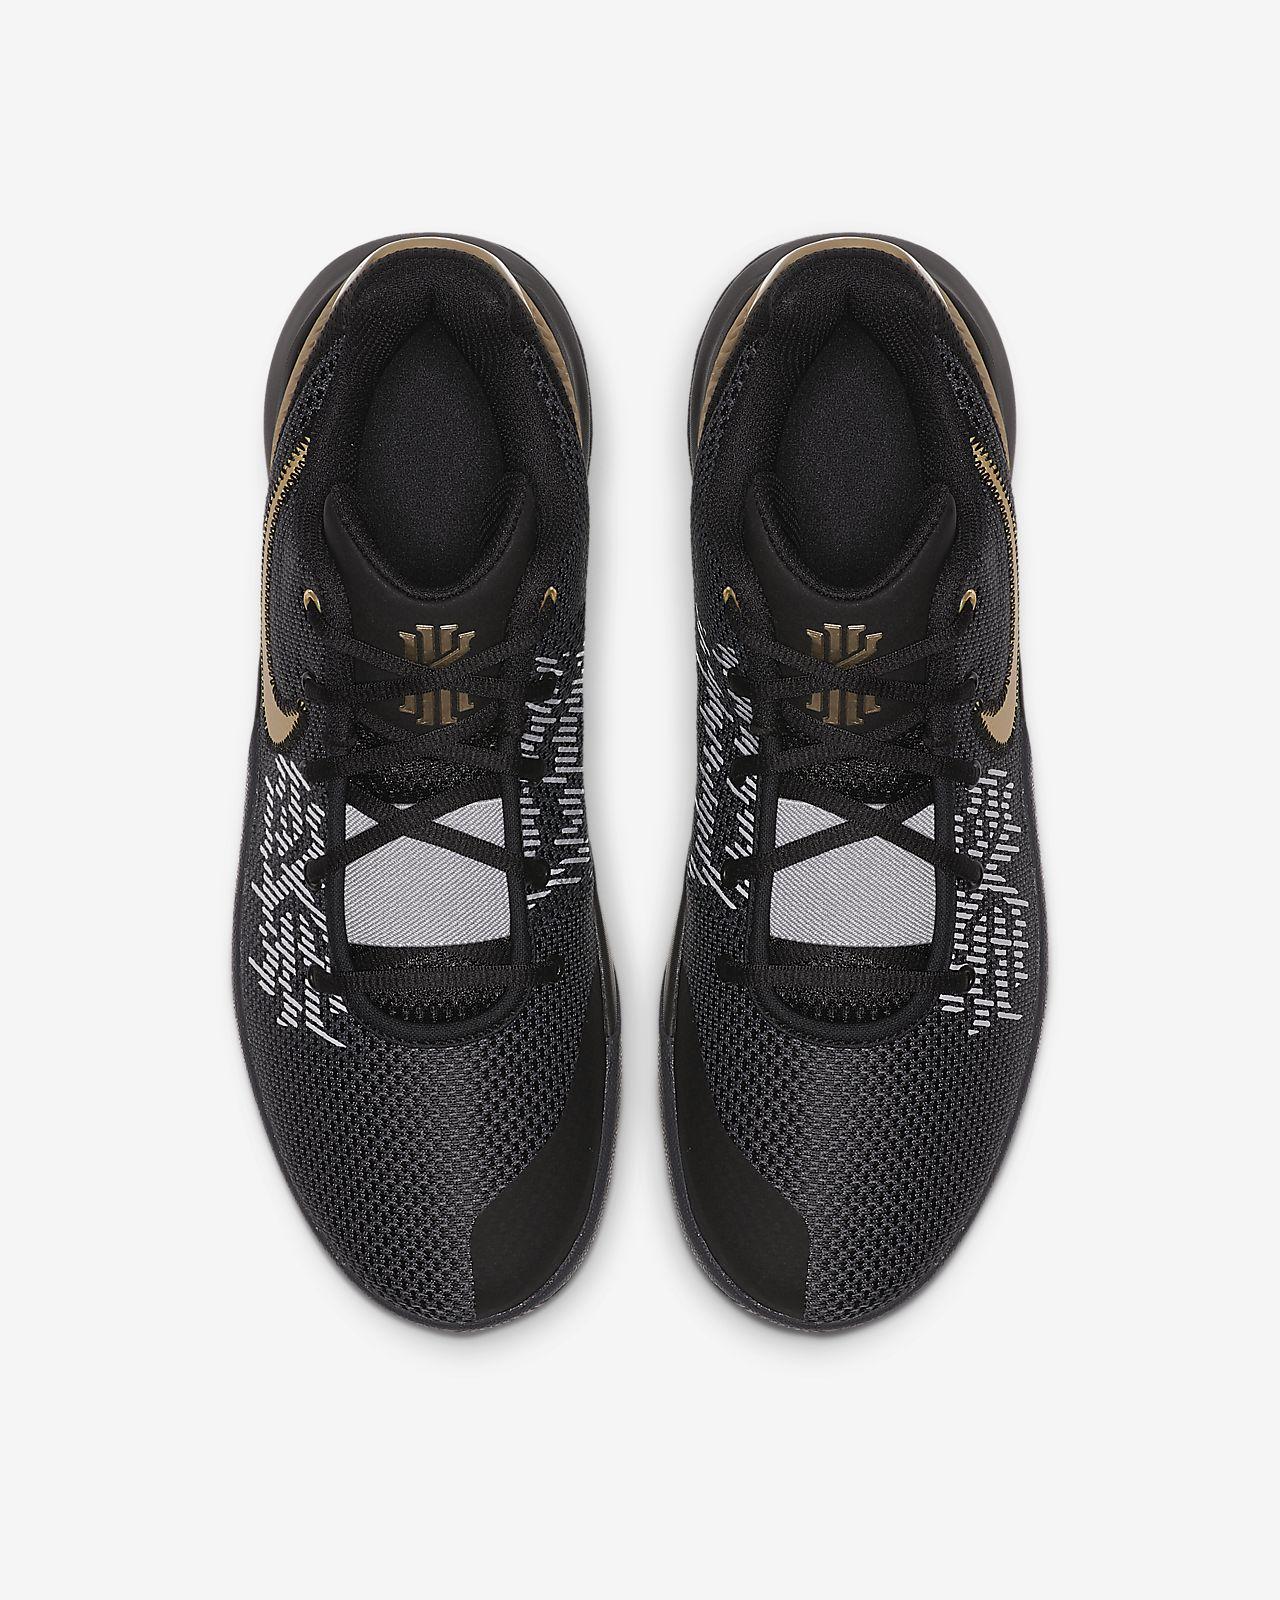 check out 8b61a 032e9 Kyrie Flytrap II Basketball Shoe